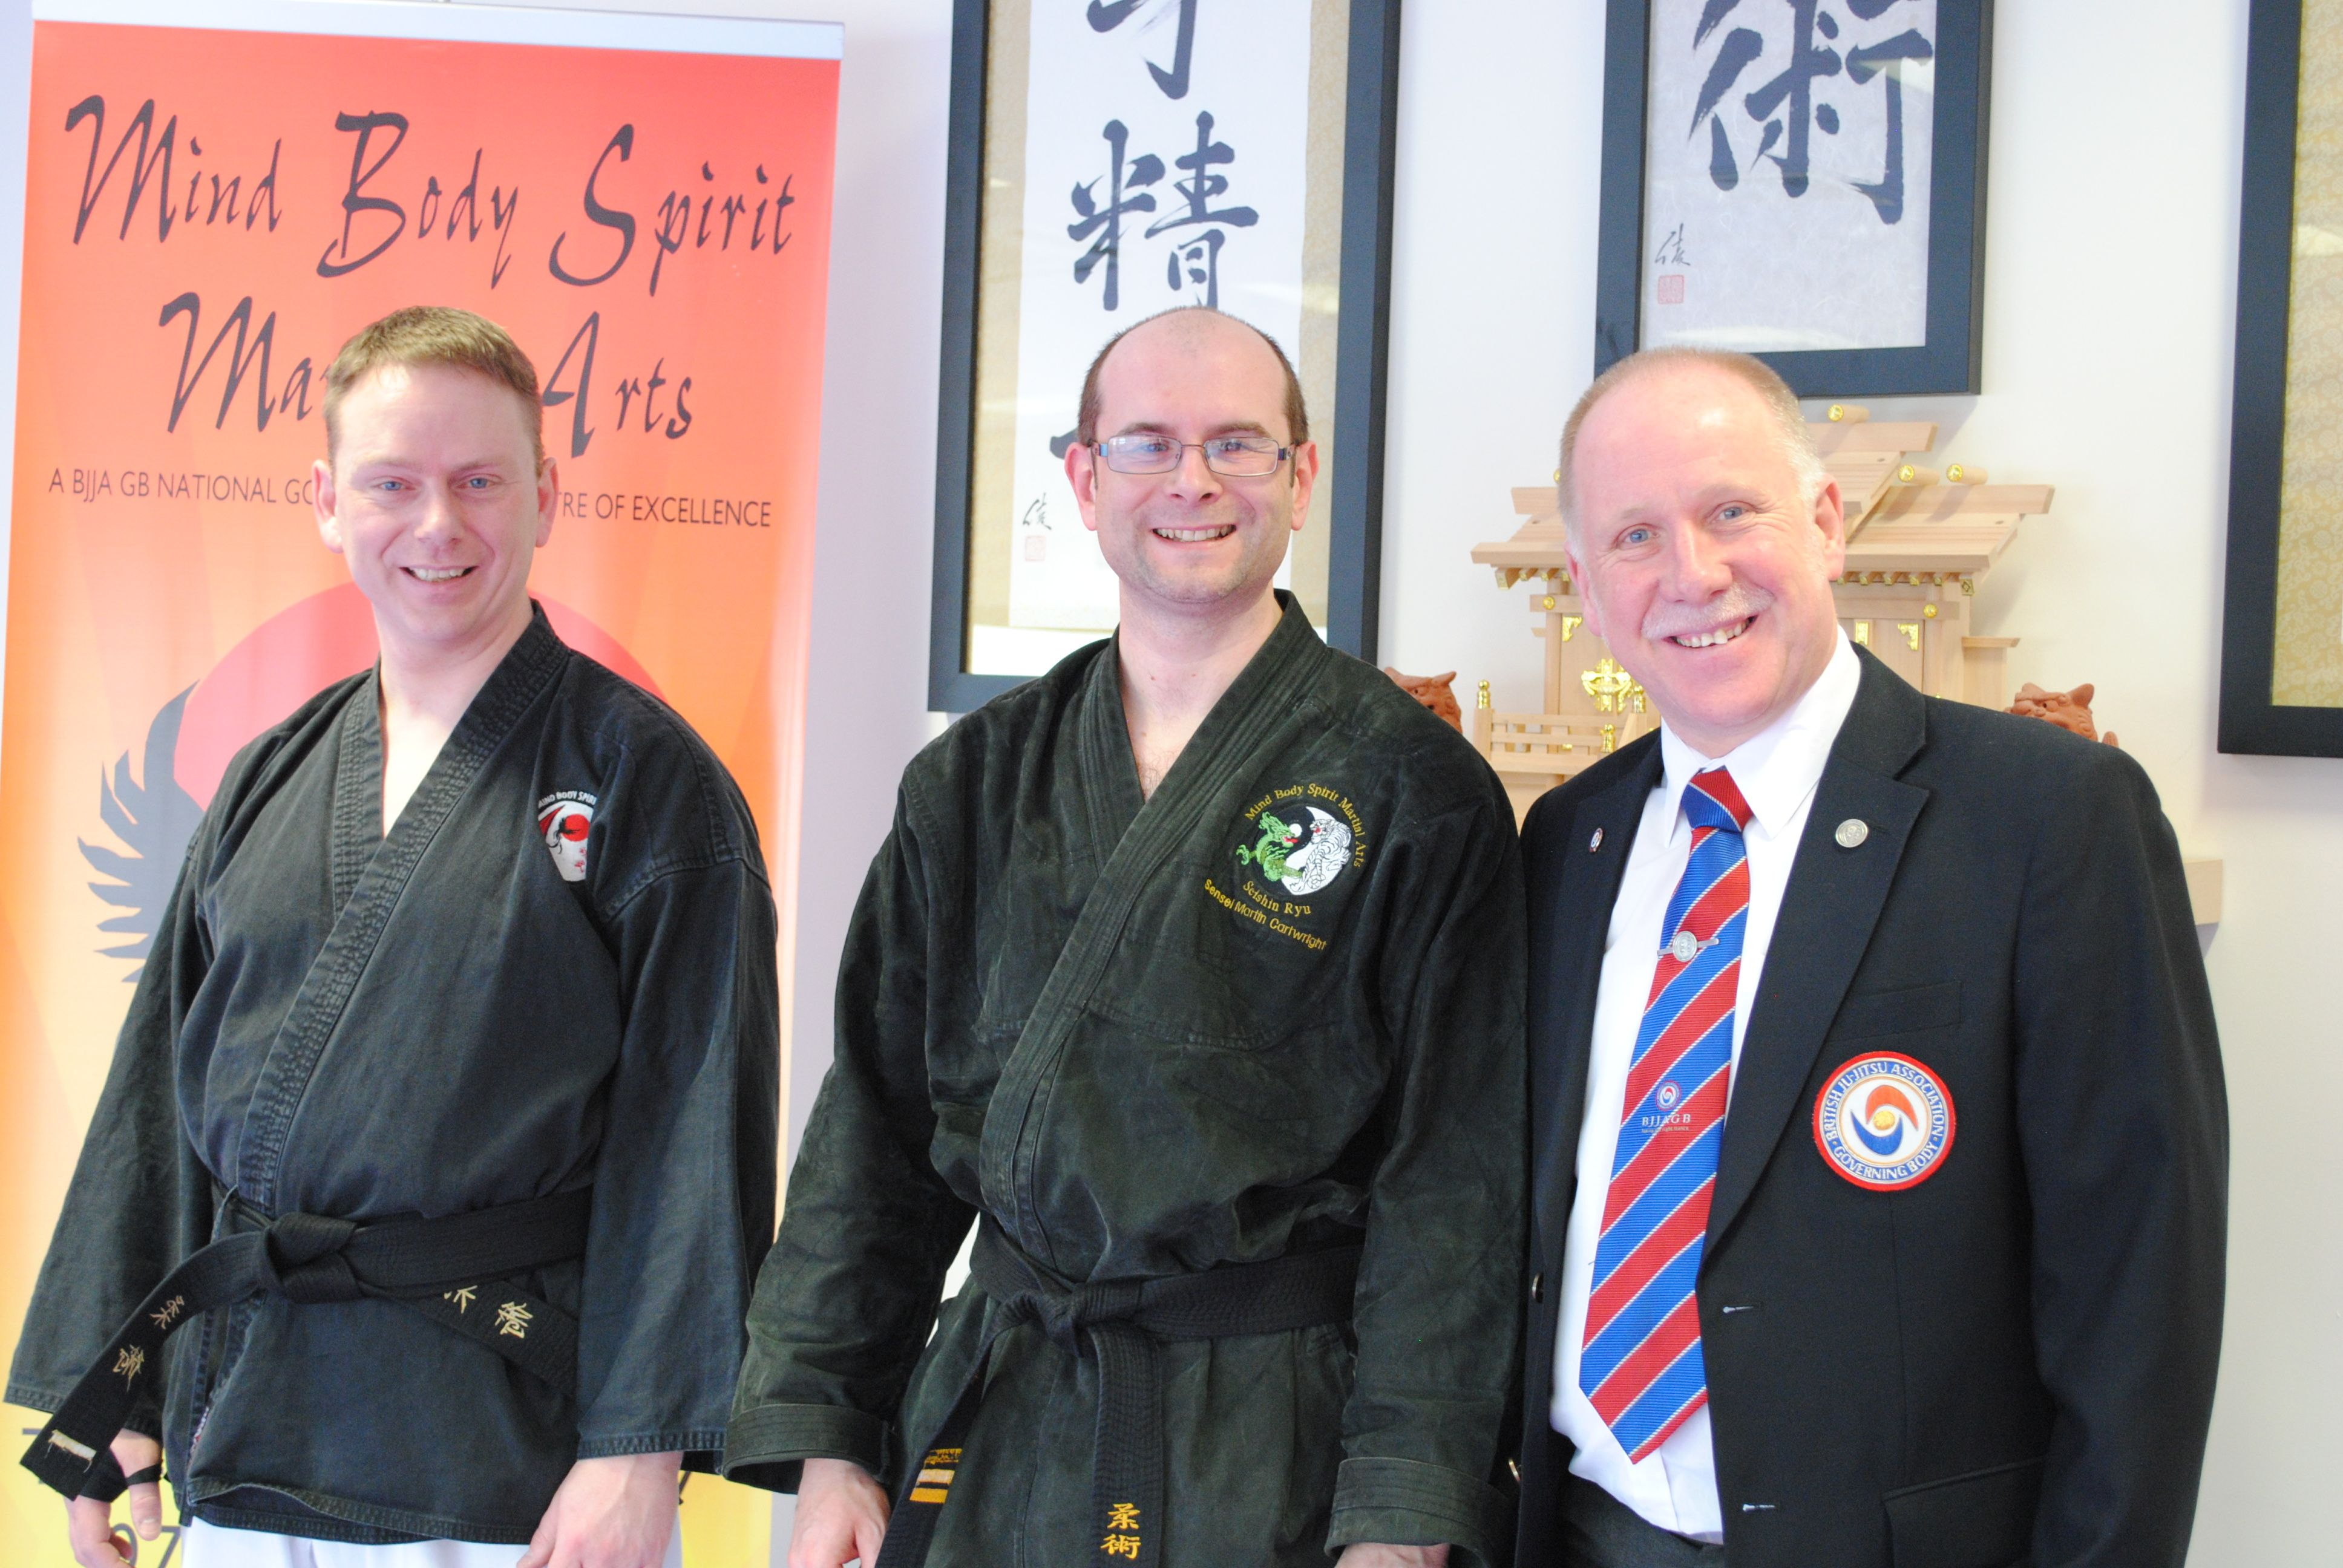 Pin On Mind Body Spirit Martial Arts